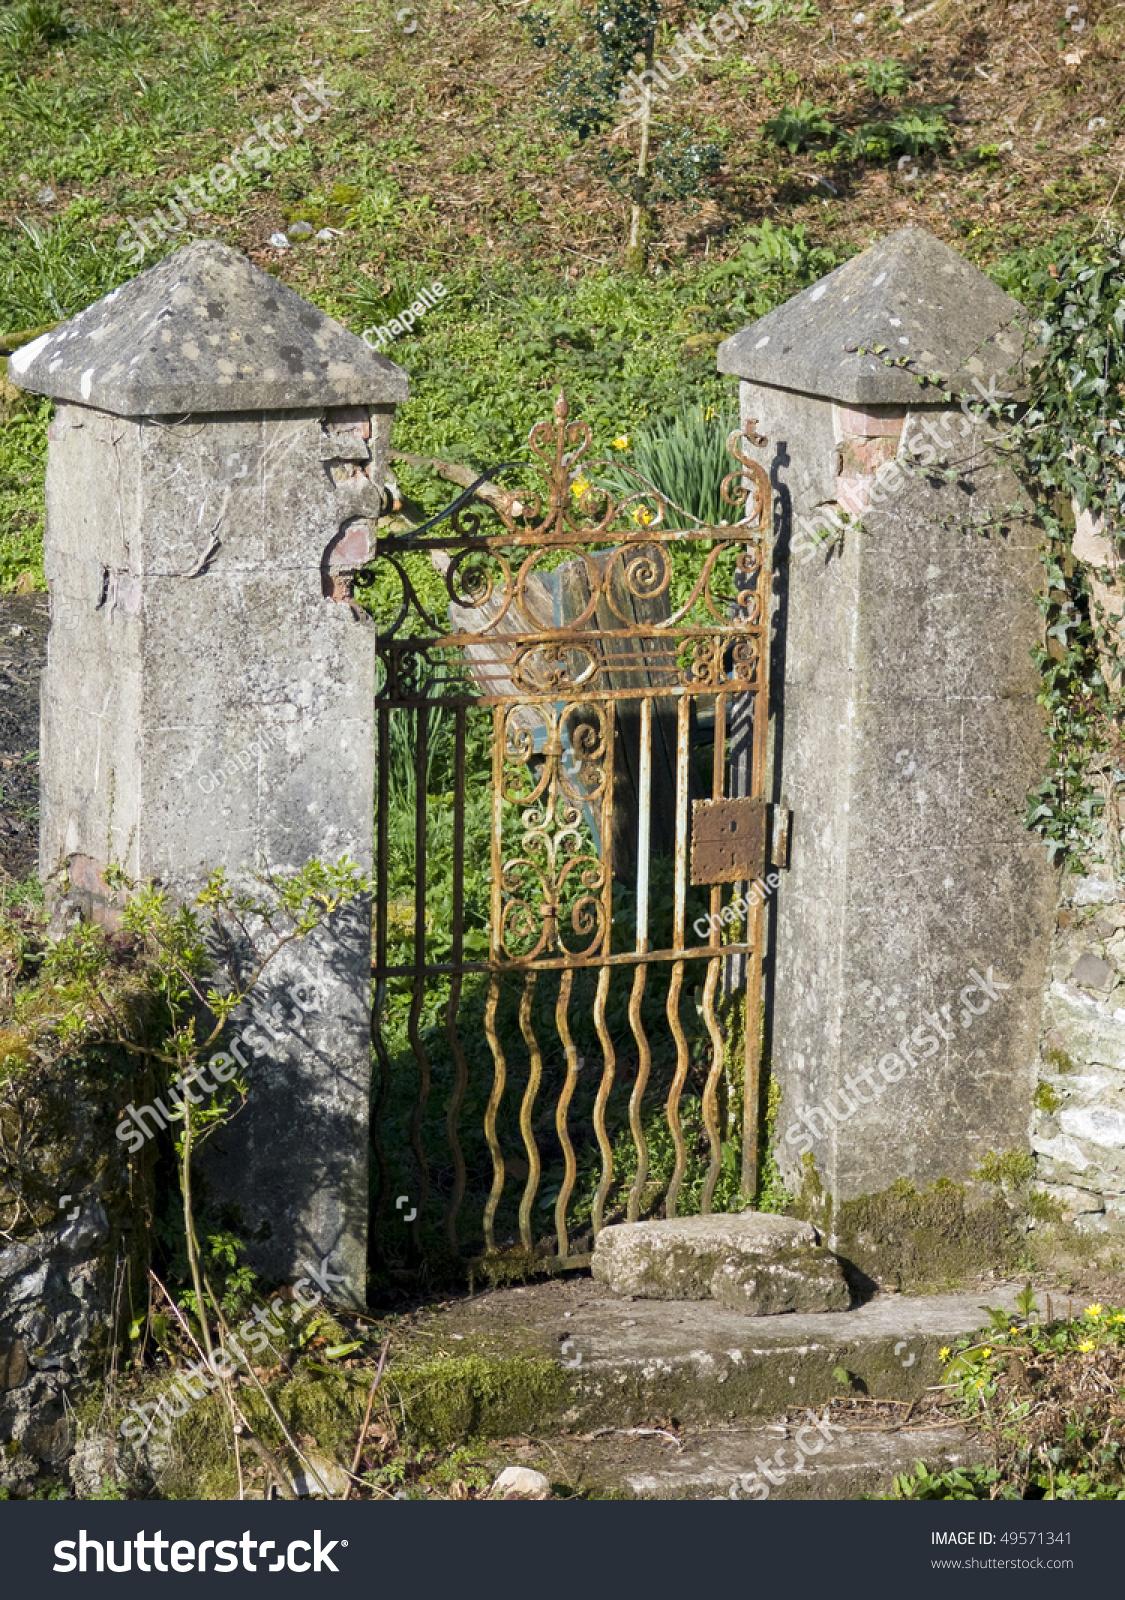 Old Stone Pillars : Old rusting fancy iron gate between decaying stone pillars